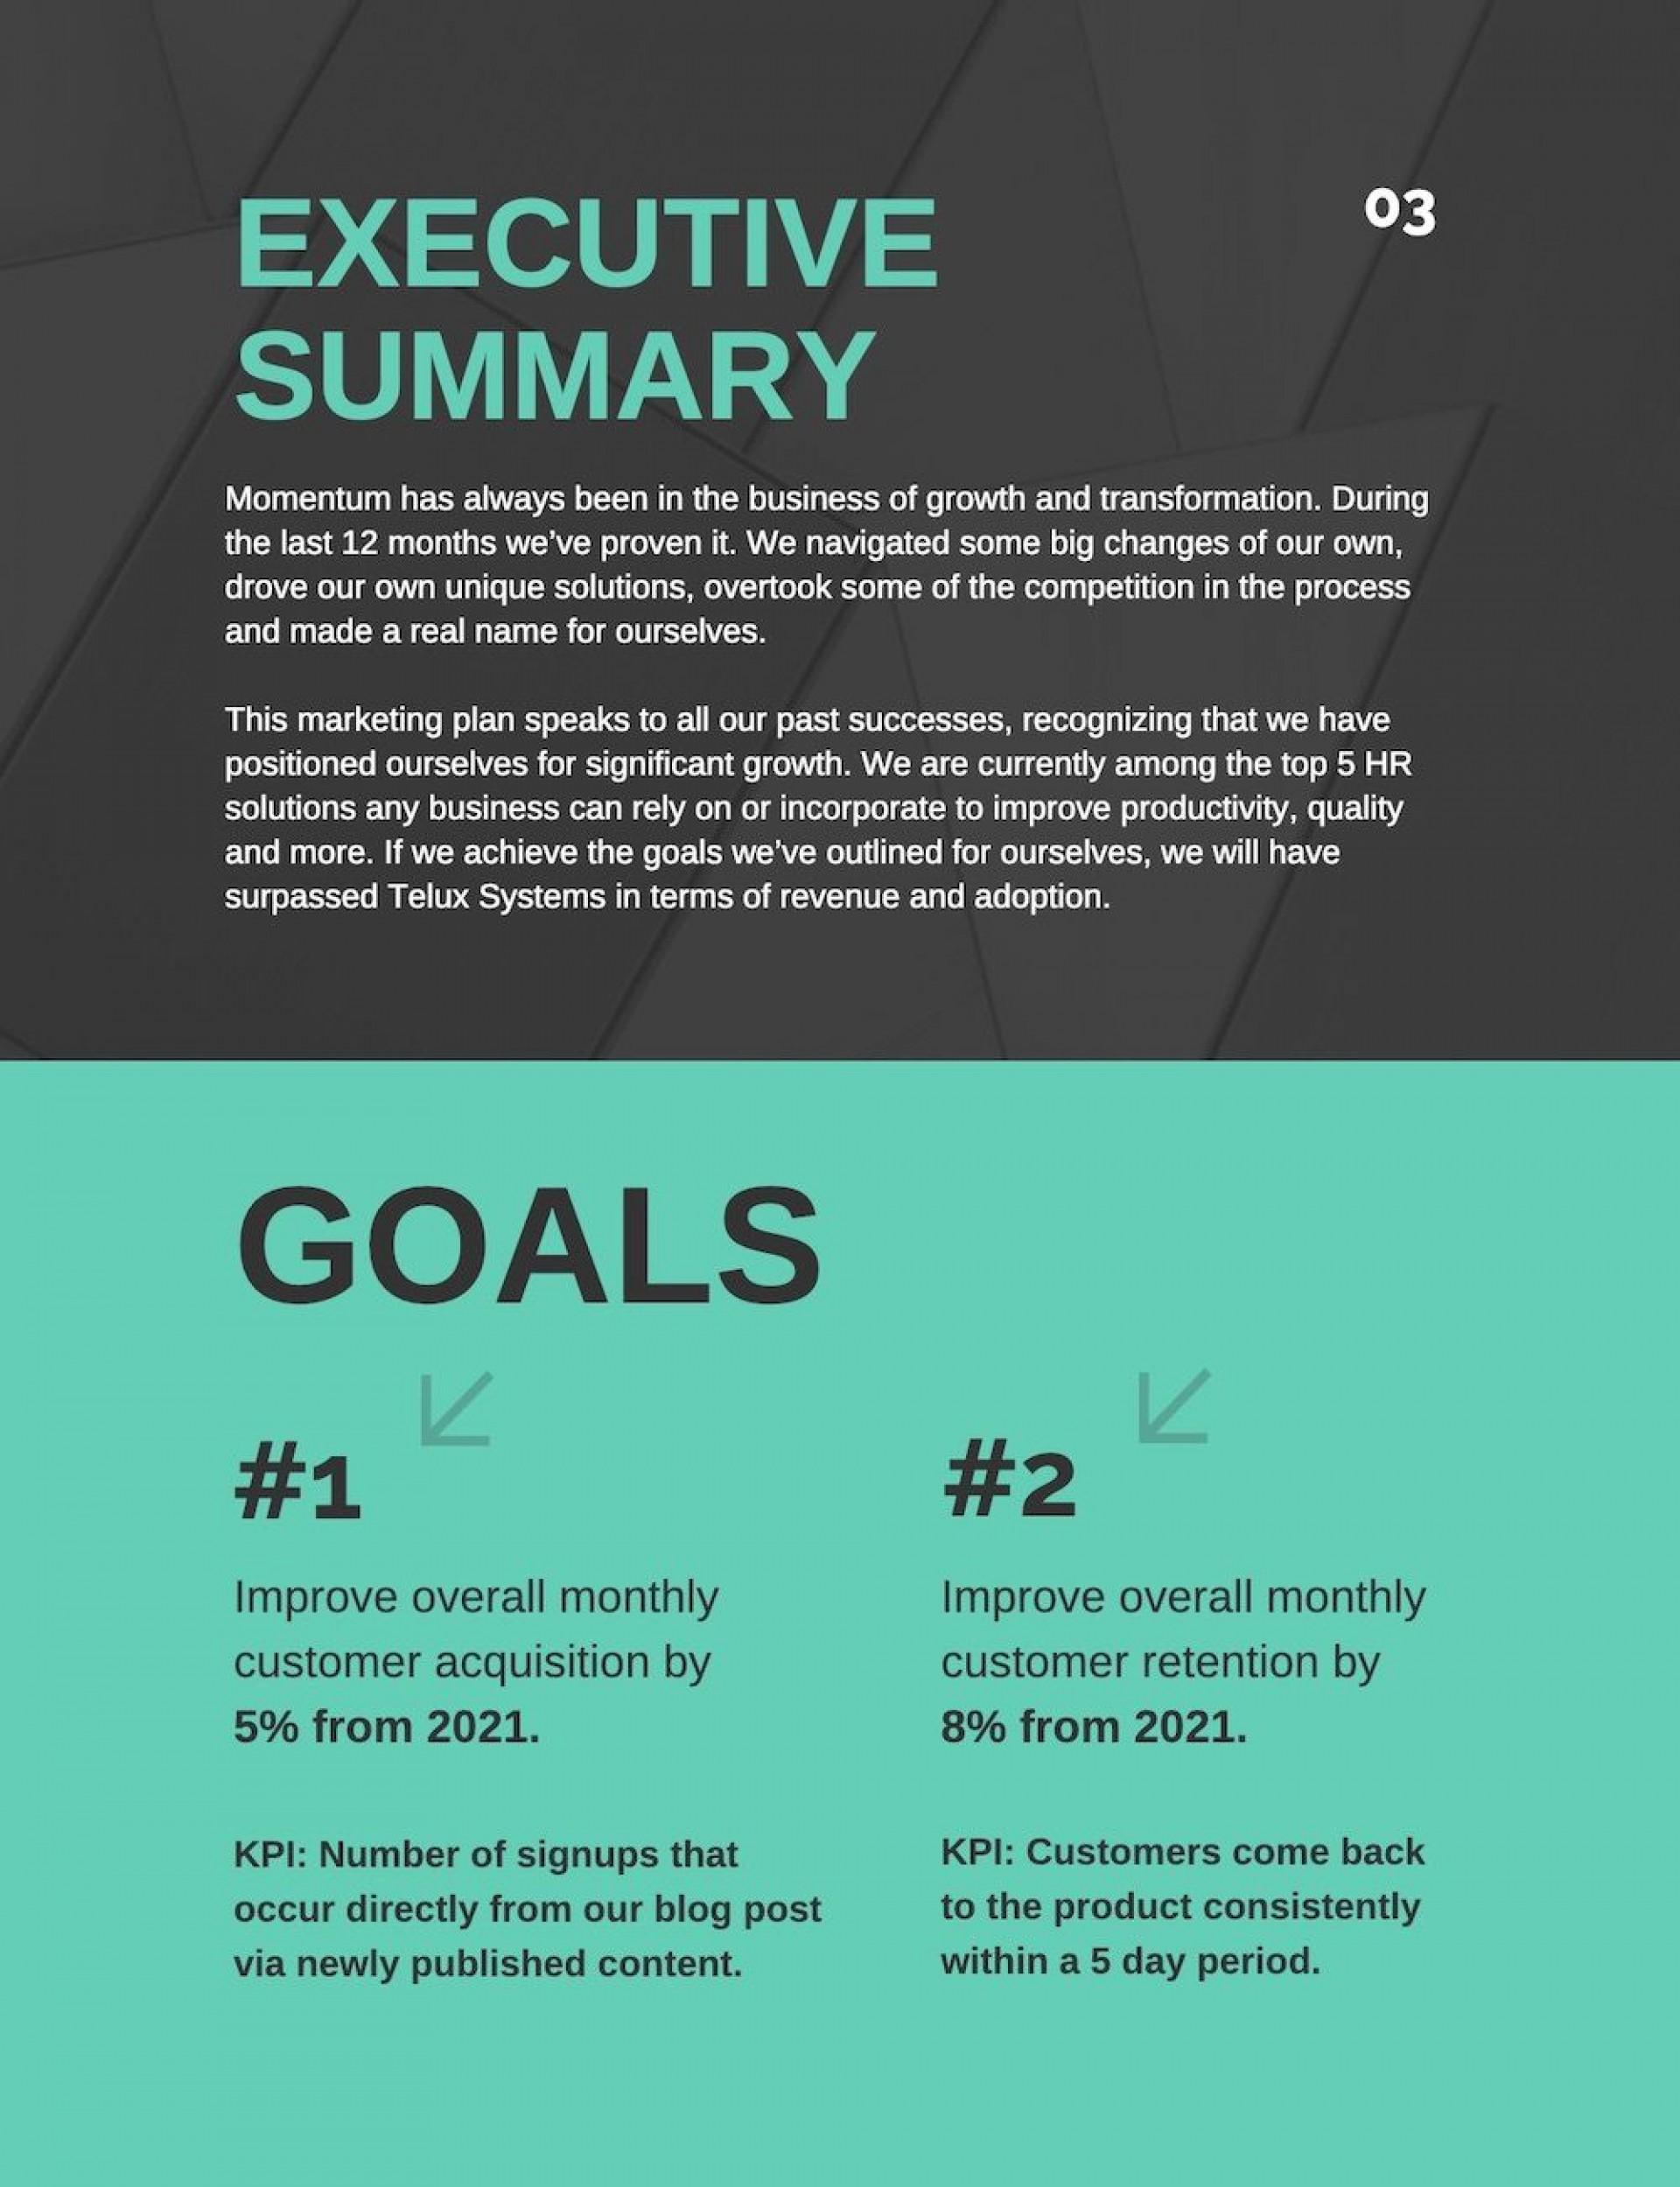 006 Shocking Multi Level Marketing Busines Plan Template Sample  Network Pdf1920